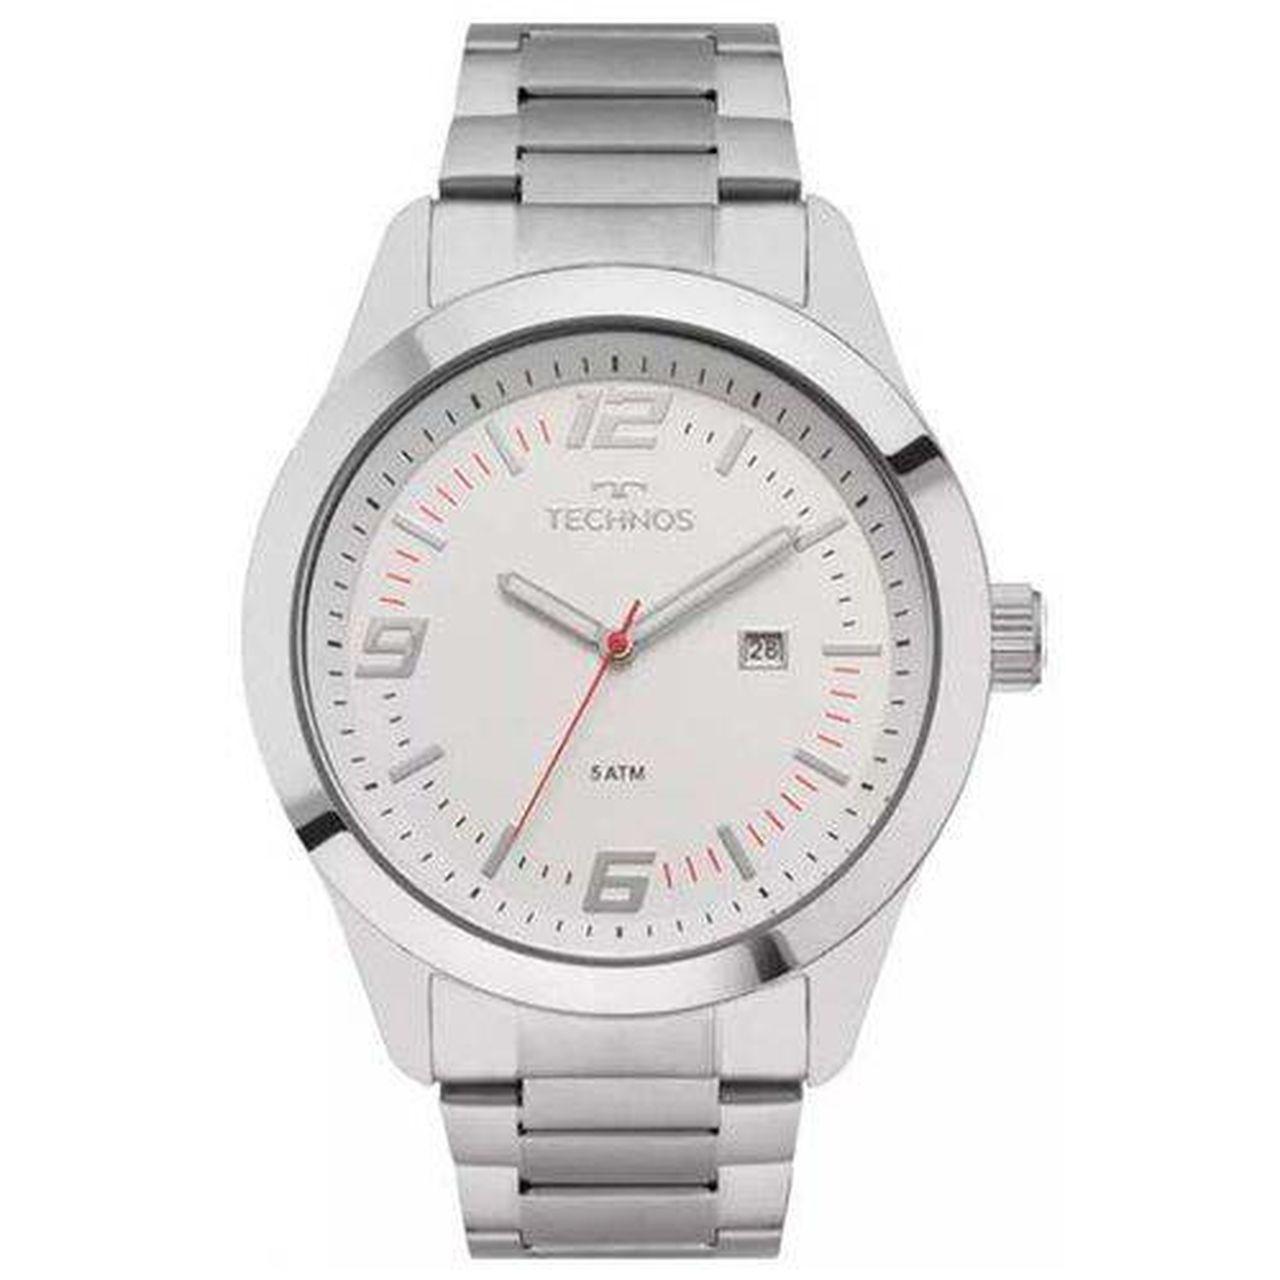 Relógio Technos Performance Racer Masculino 2115mny/1b Prateado Com Fundo Branco